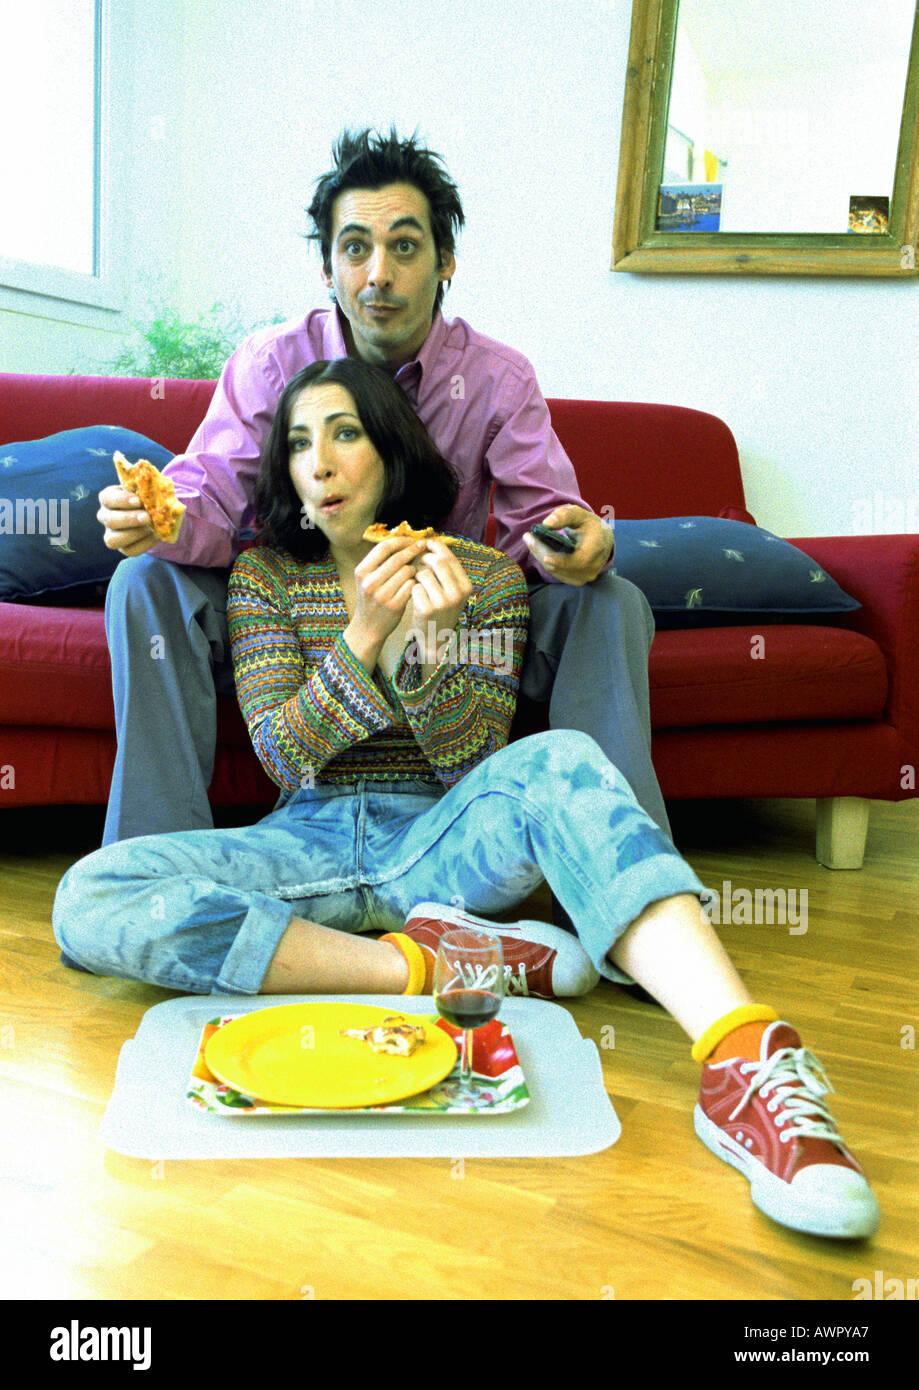 Uomo seduto sul divano, donna seduta sul pavimento tra uomo gambe. Foto Stock